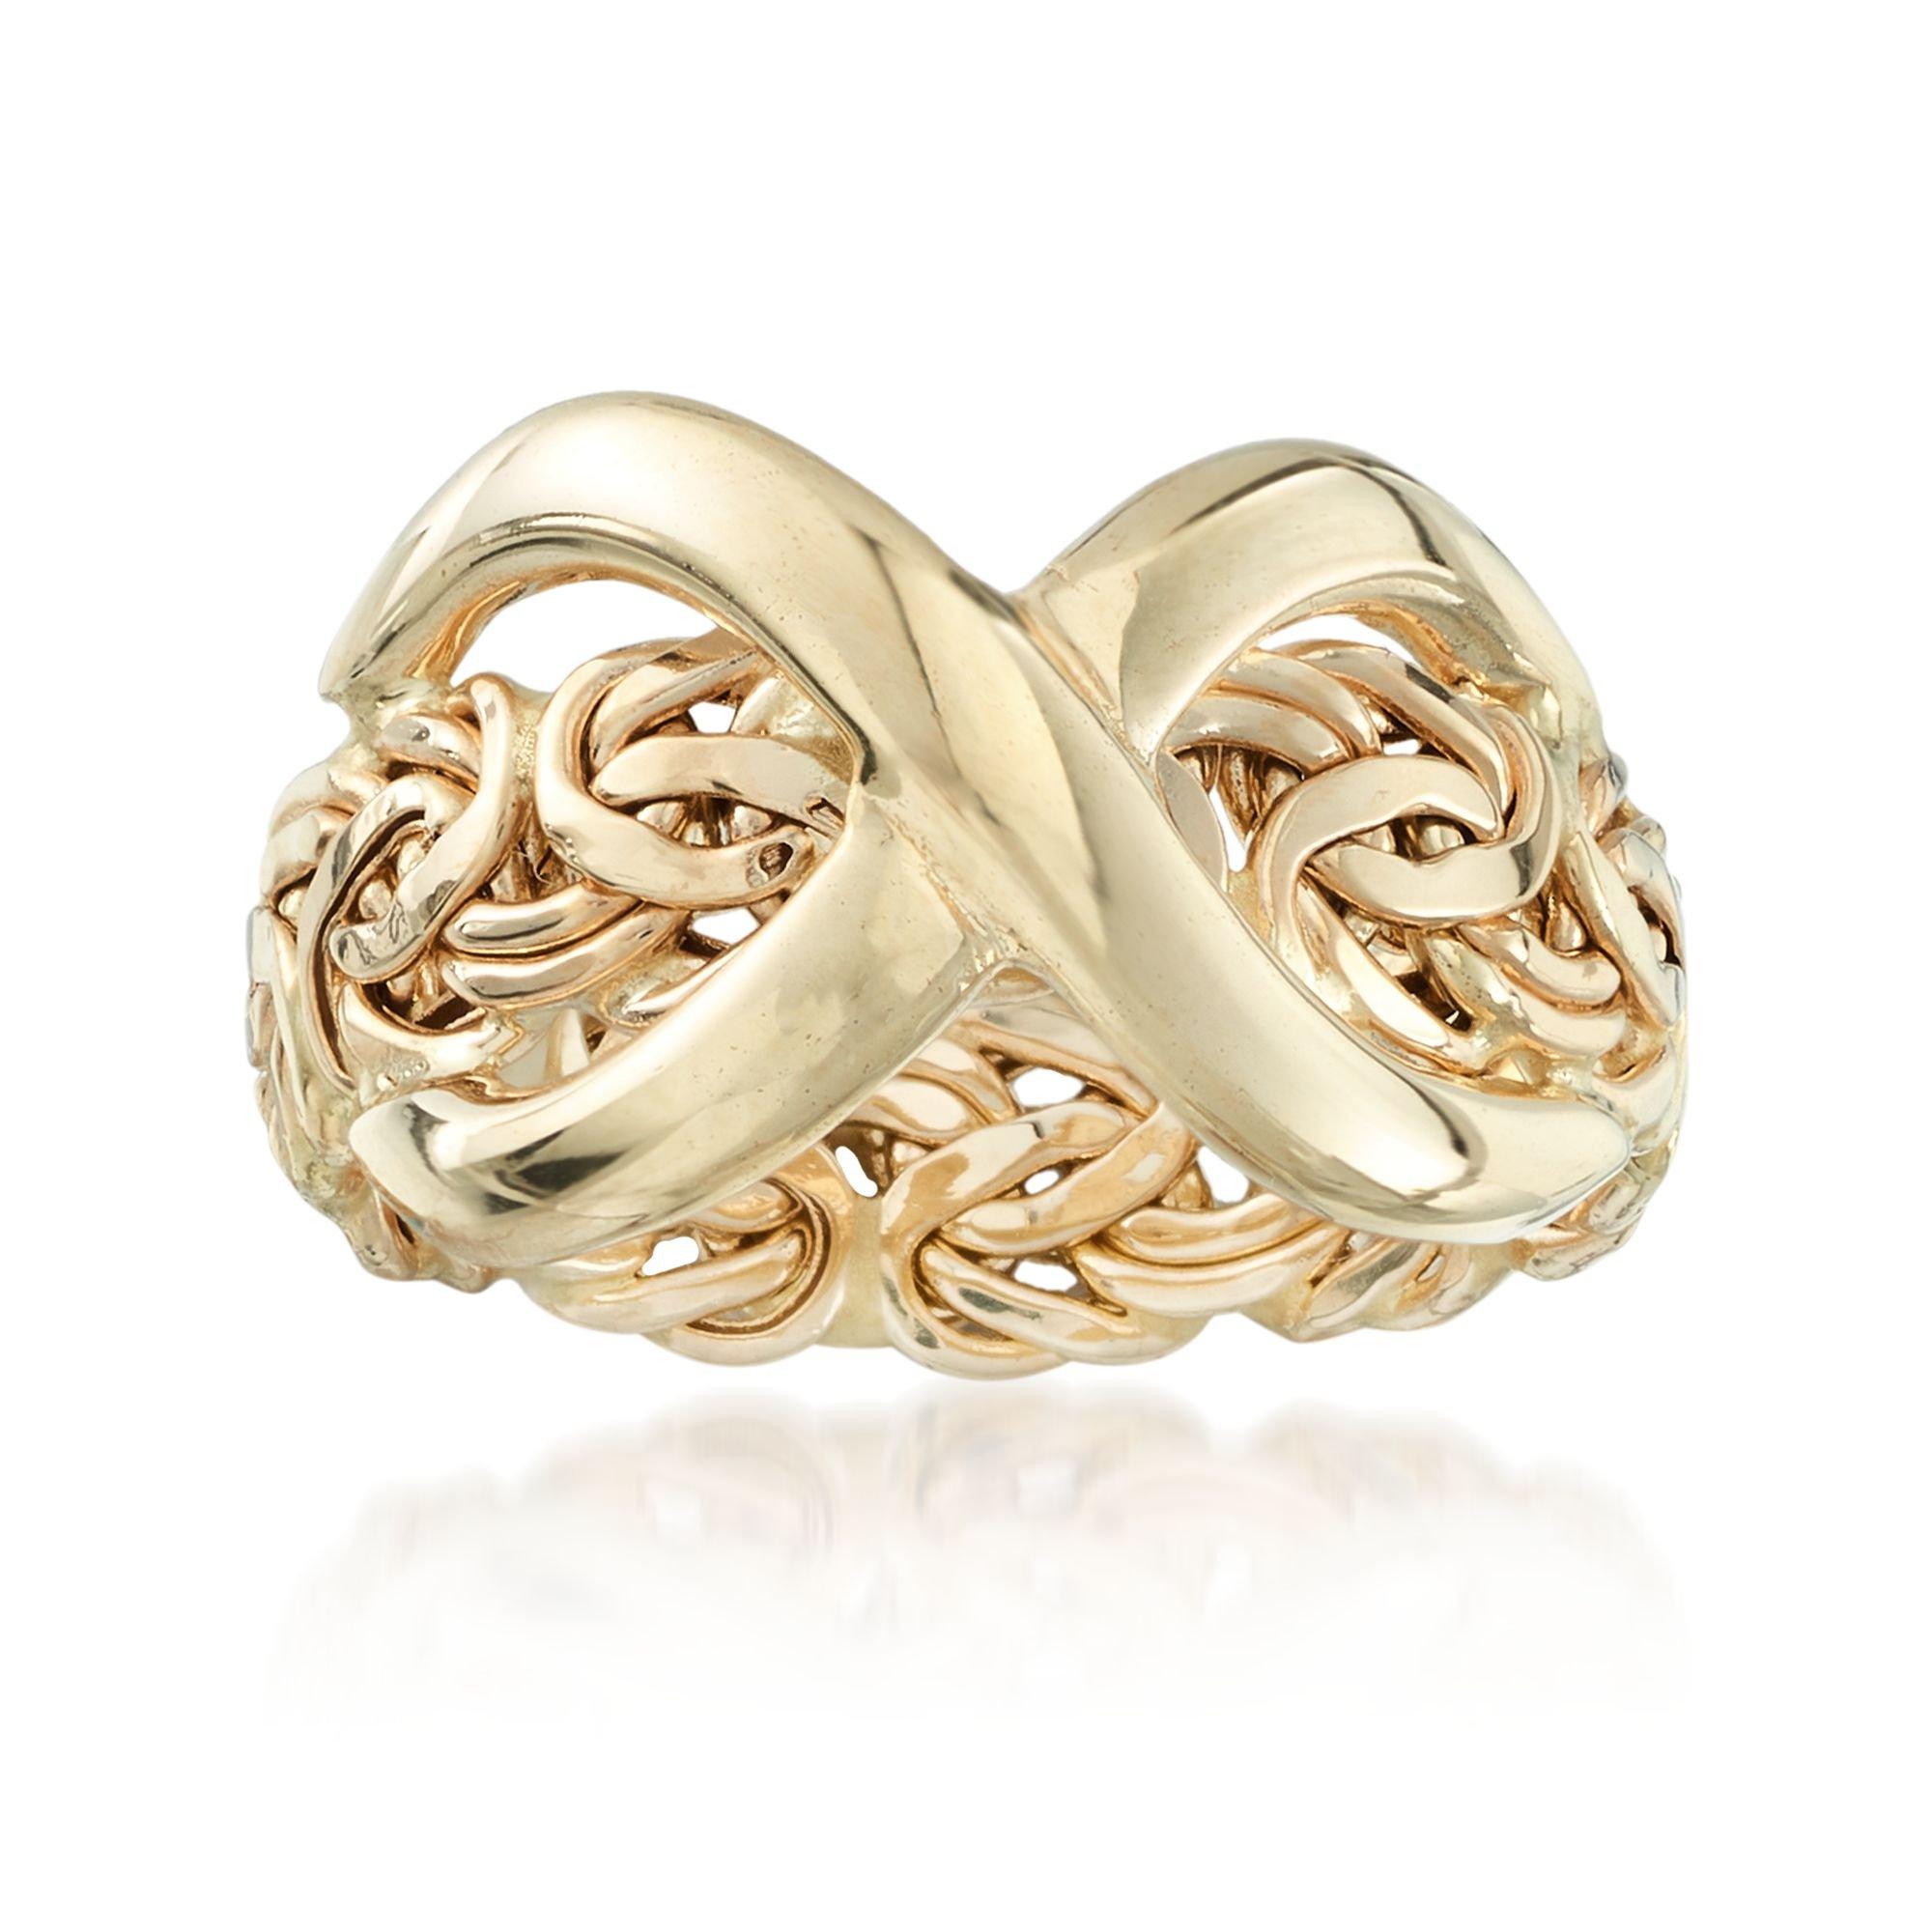 Ross-Simons 14kt Yellow Gold Byzantine Infinity Ring